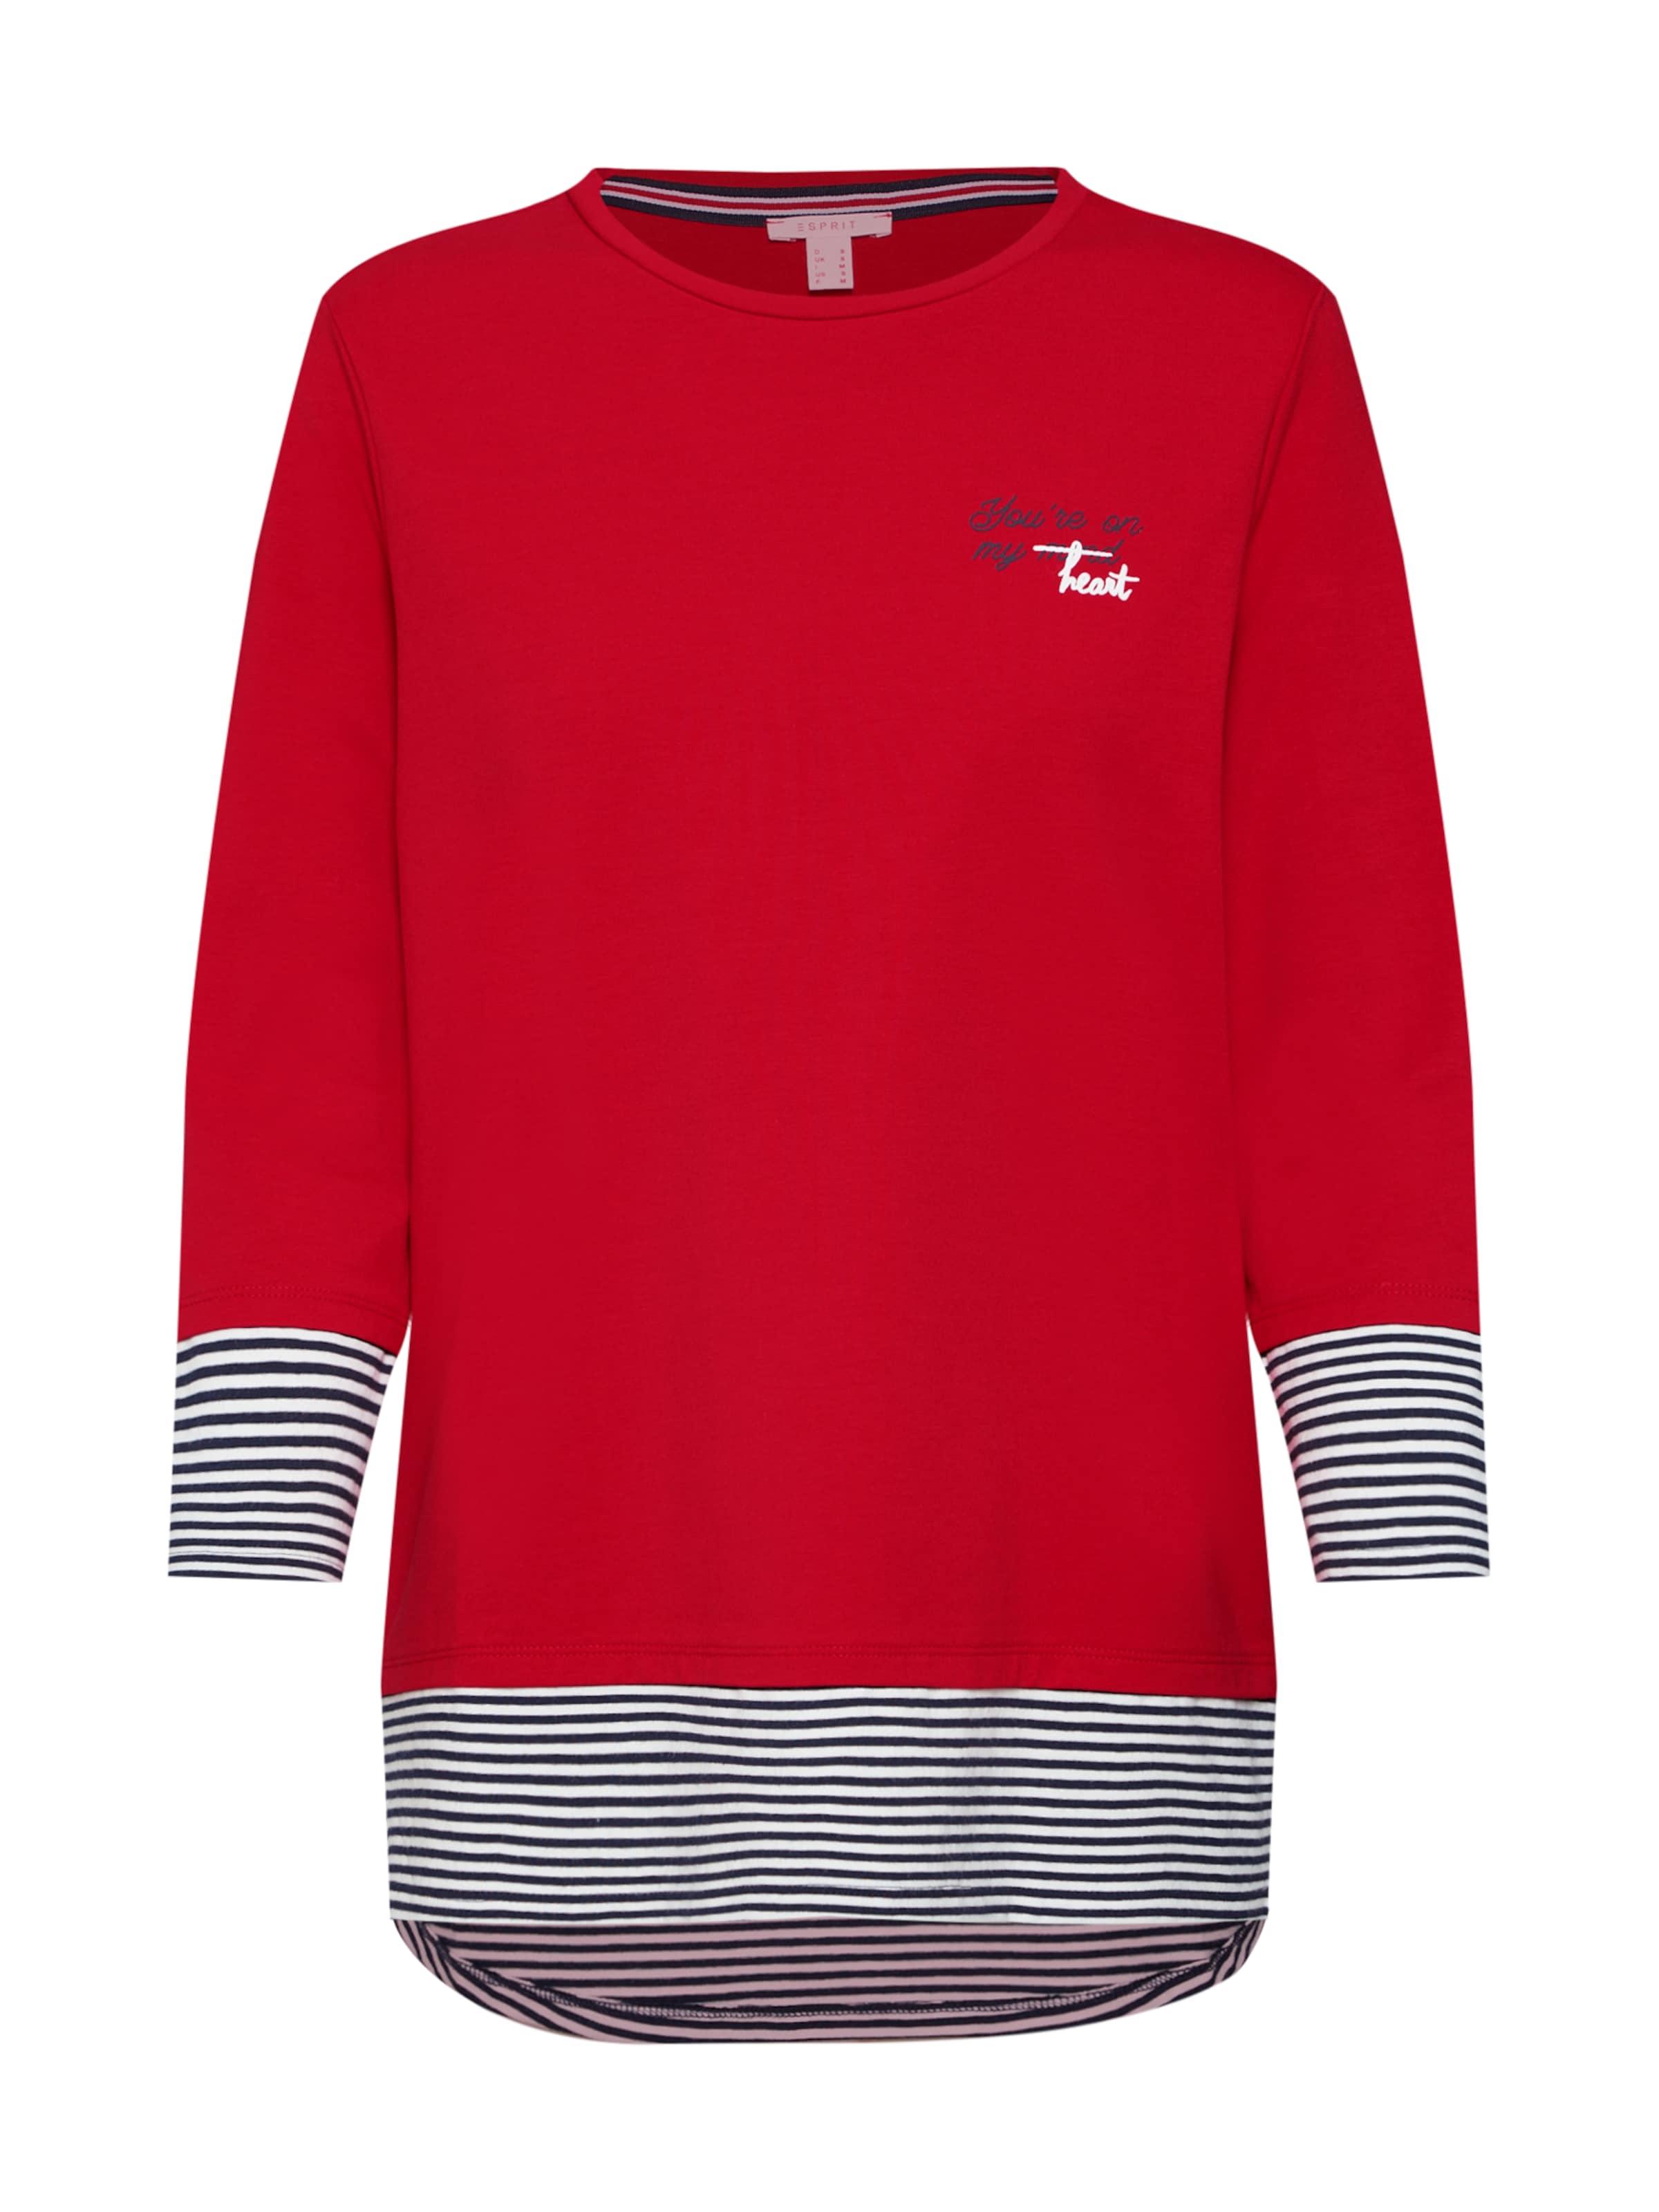 Shirt In Rood In Esprit Rood Esprit In Esprit Shirt Rood Esprit Shirt fI76yvYbg